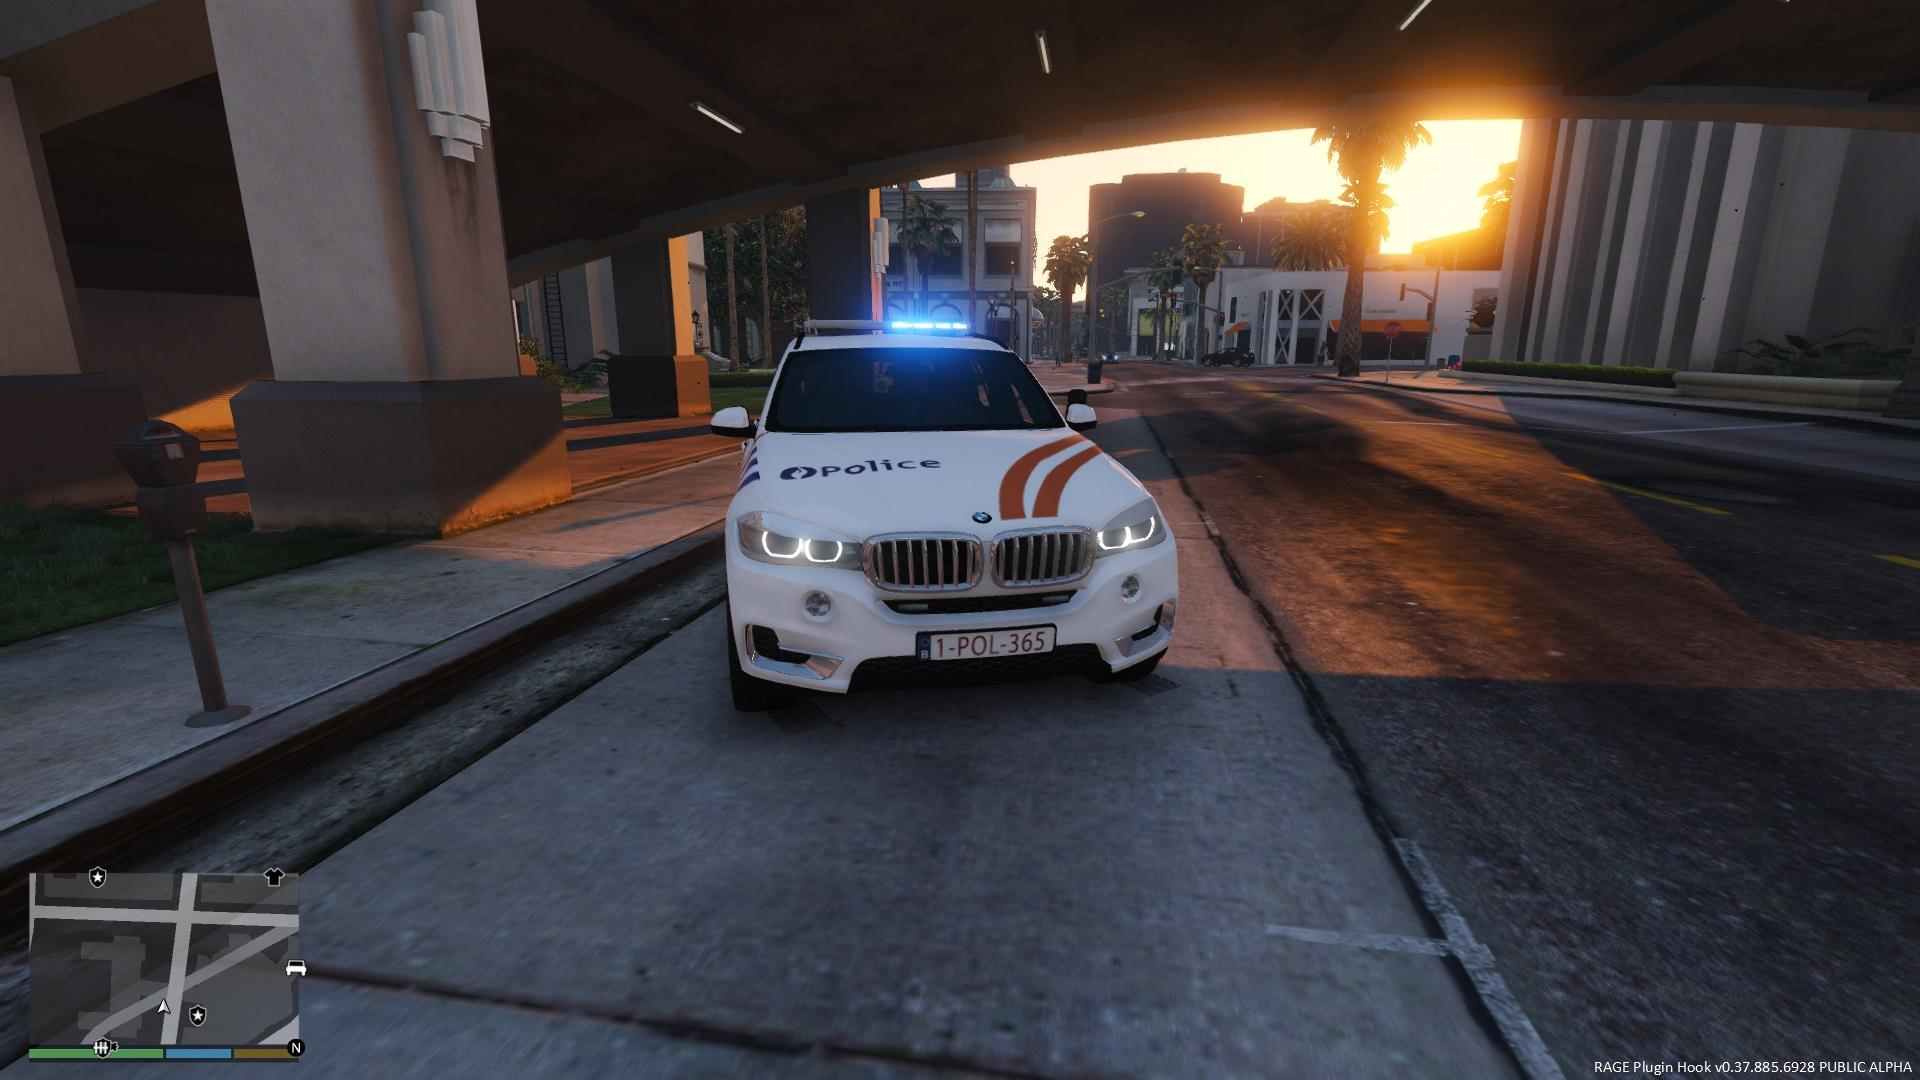 Belgium BMW X5 Police de la route - GTA5-Mods.com